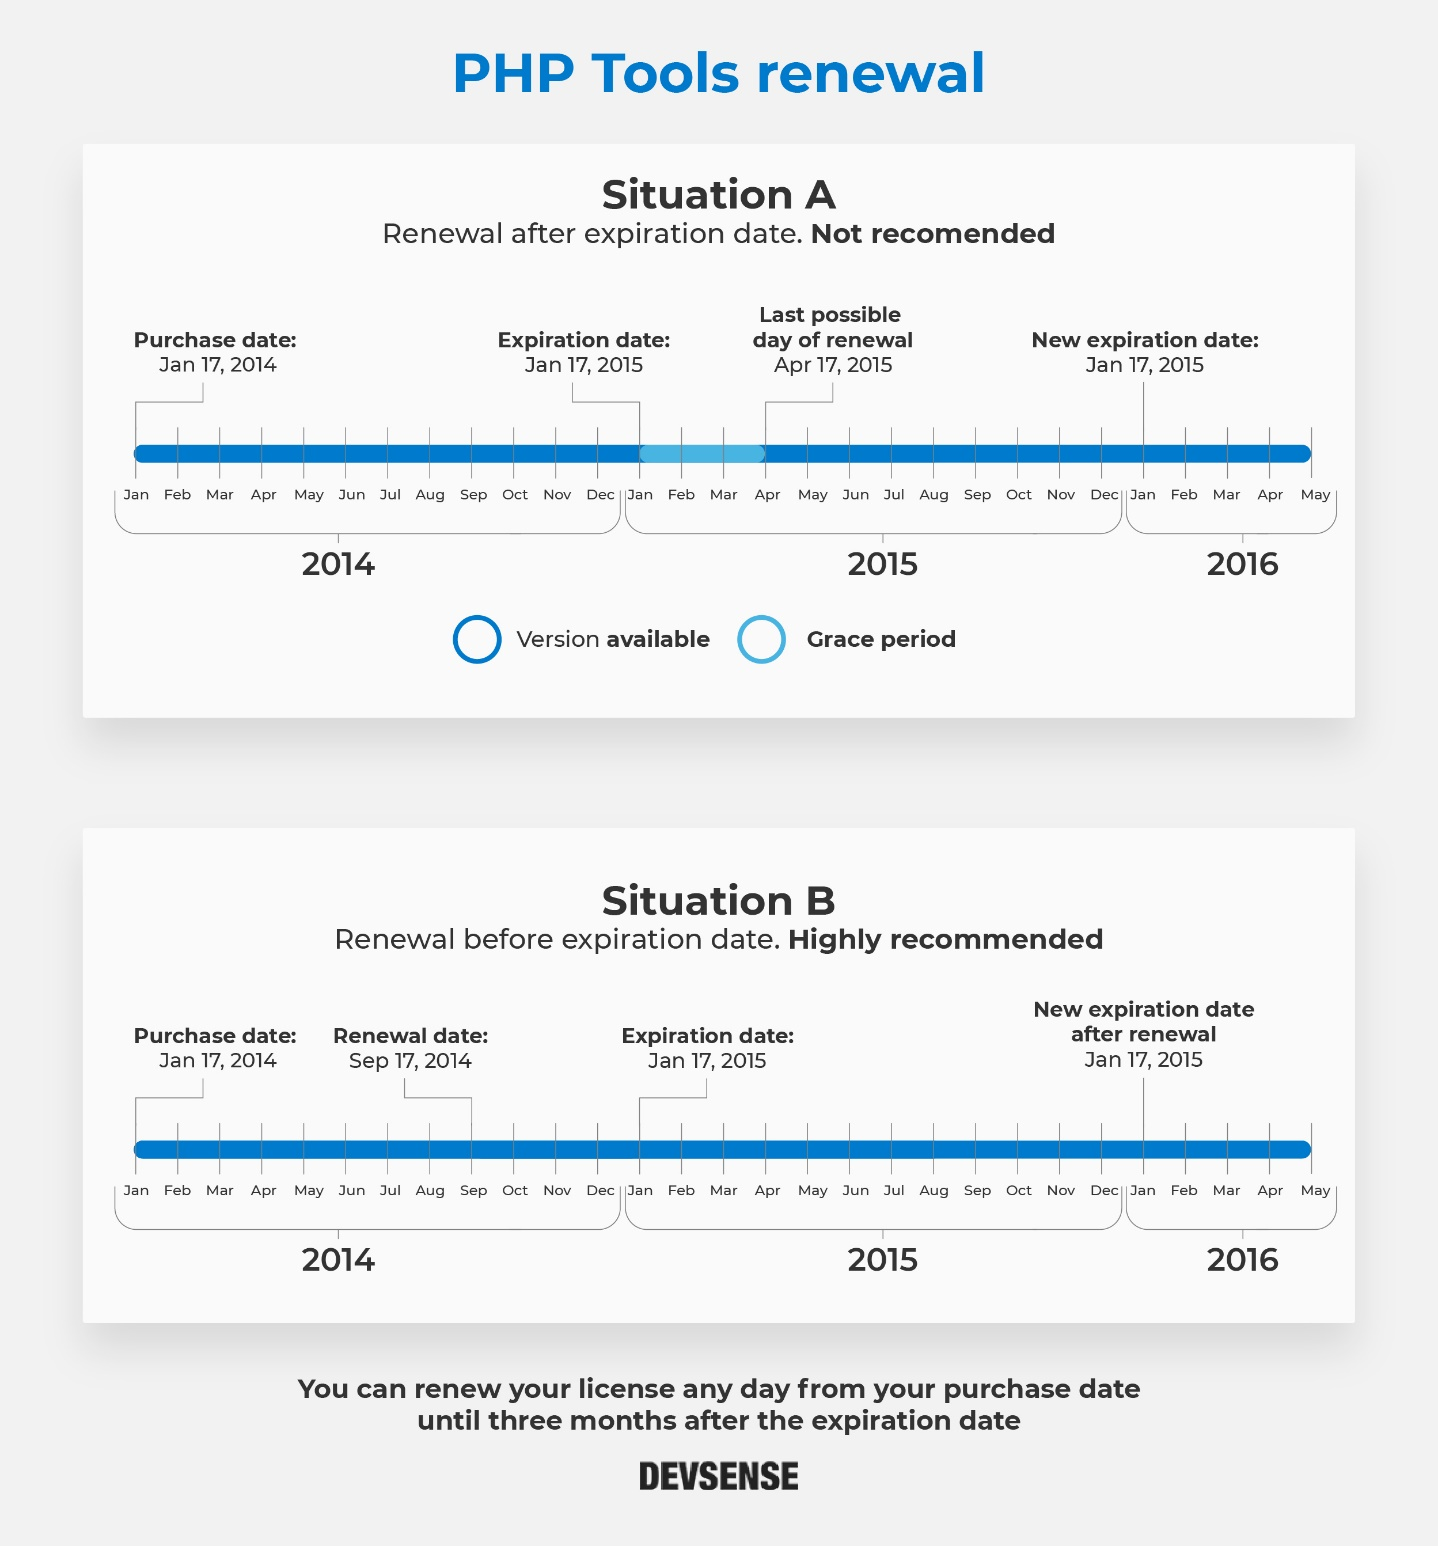 PHP Tools renewal